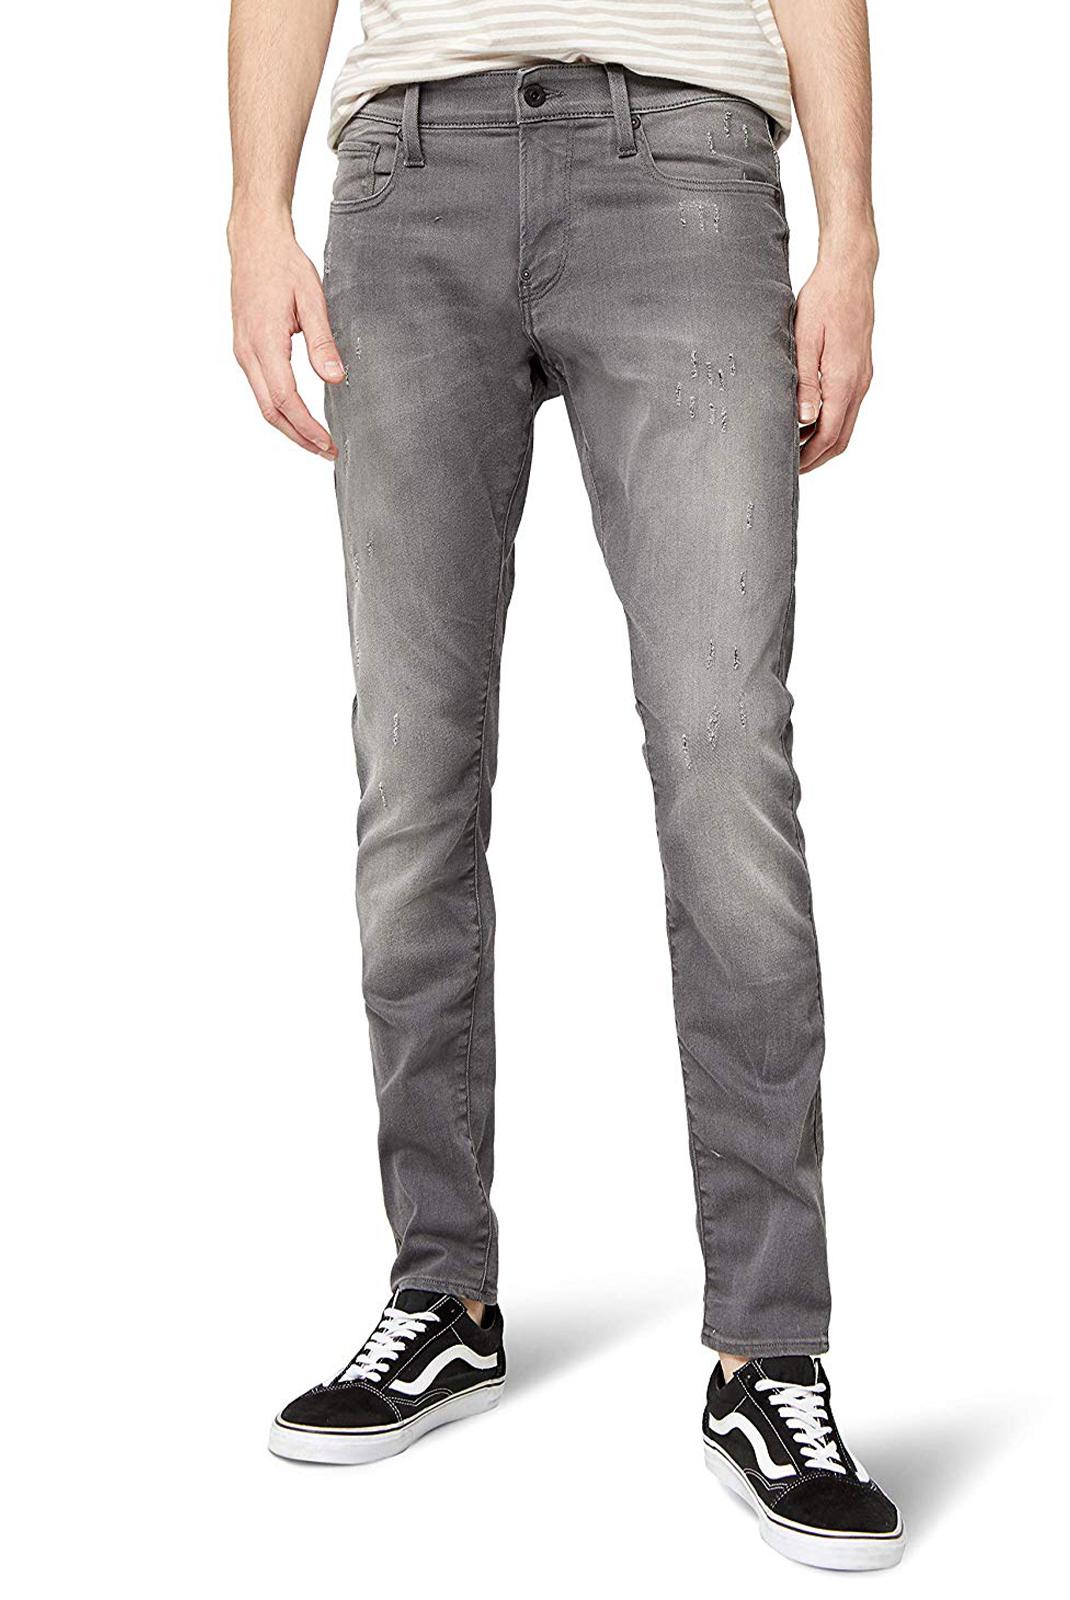 Jeans  G-star 51010-6132-1243 revend gris